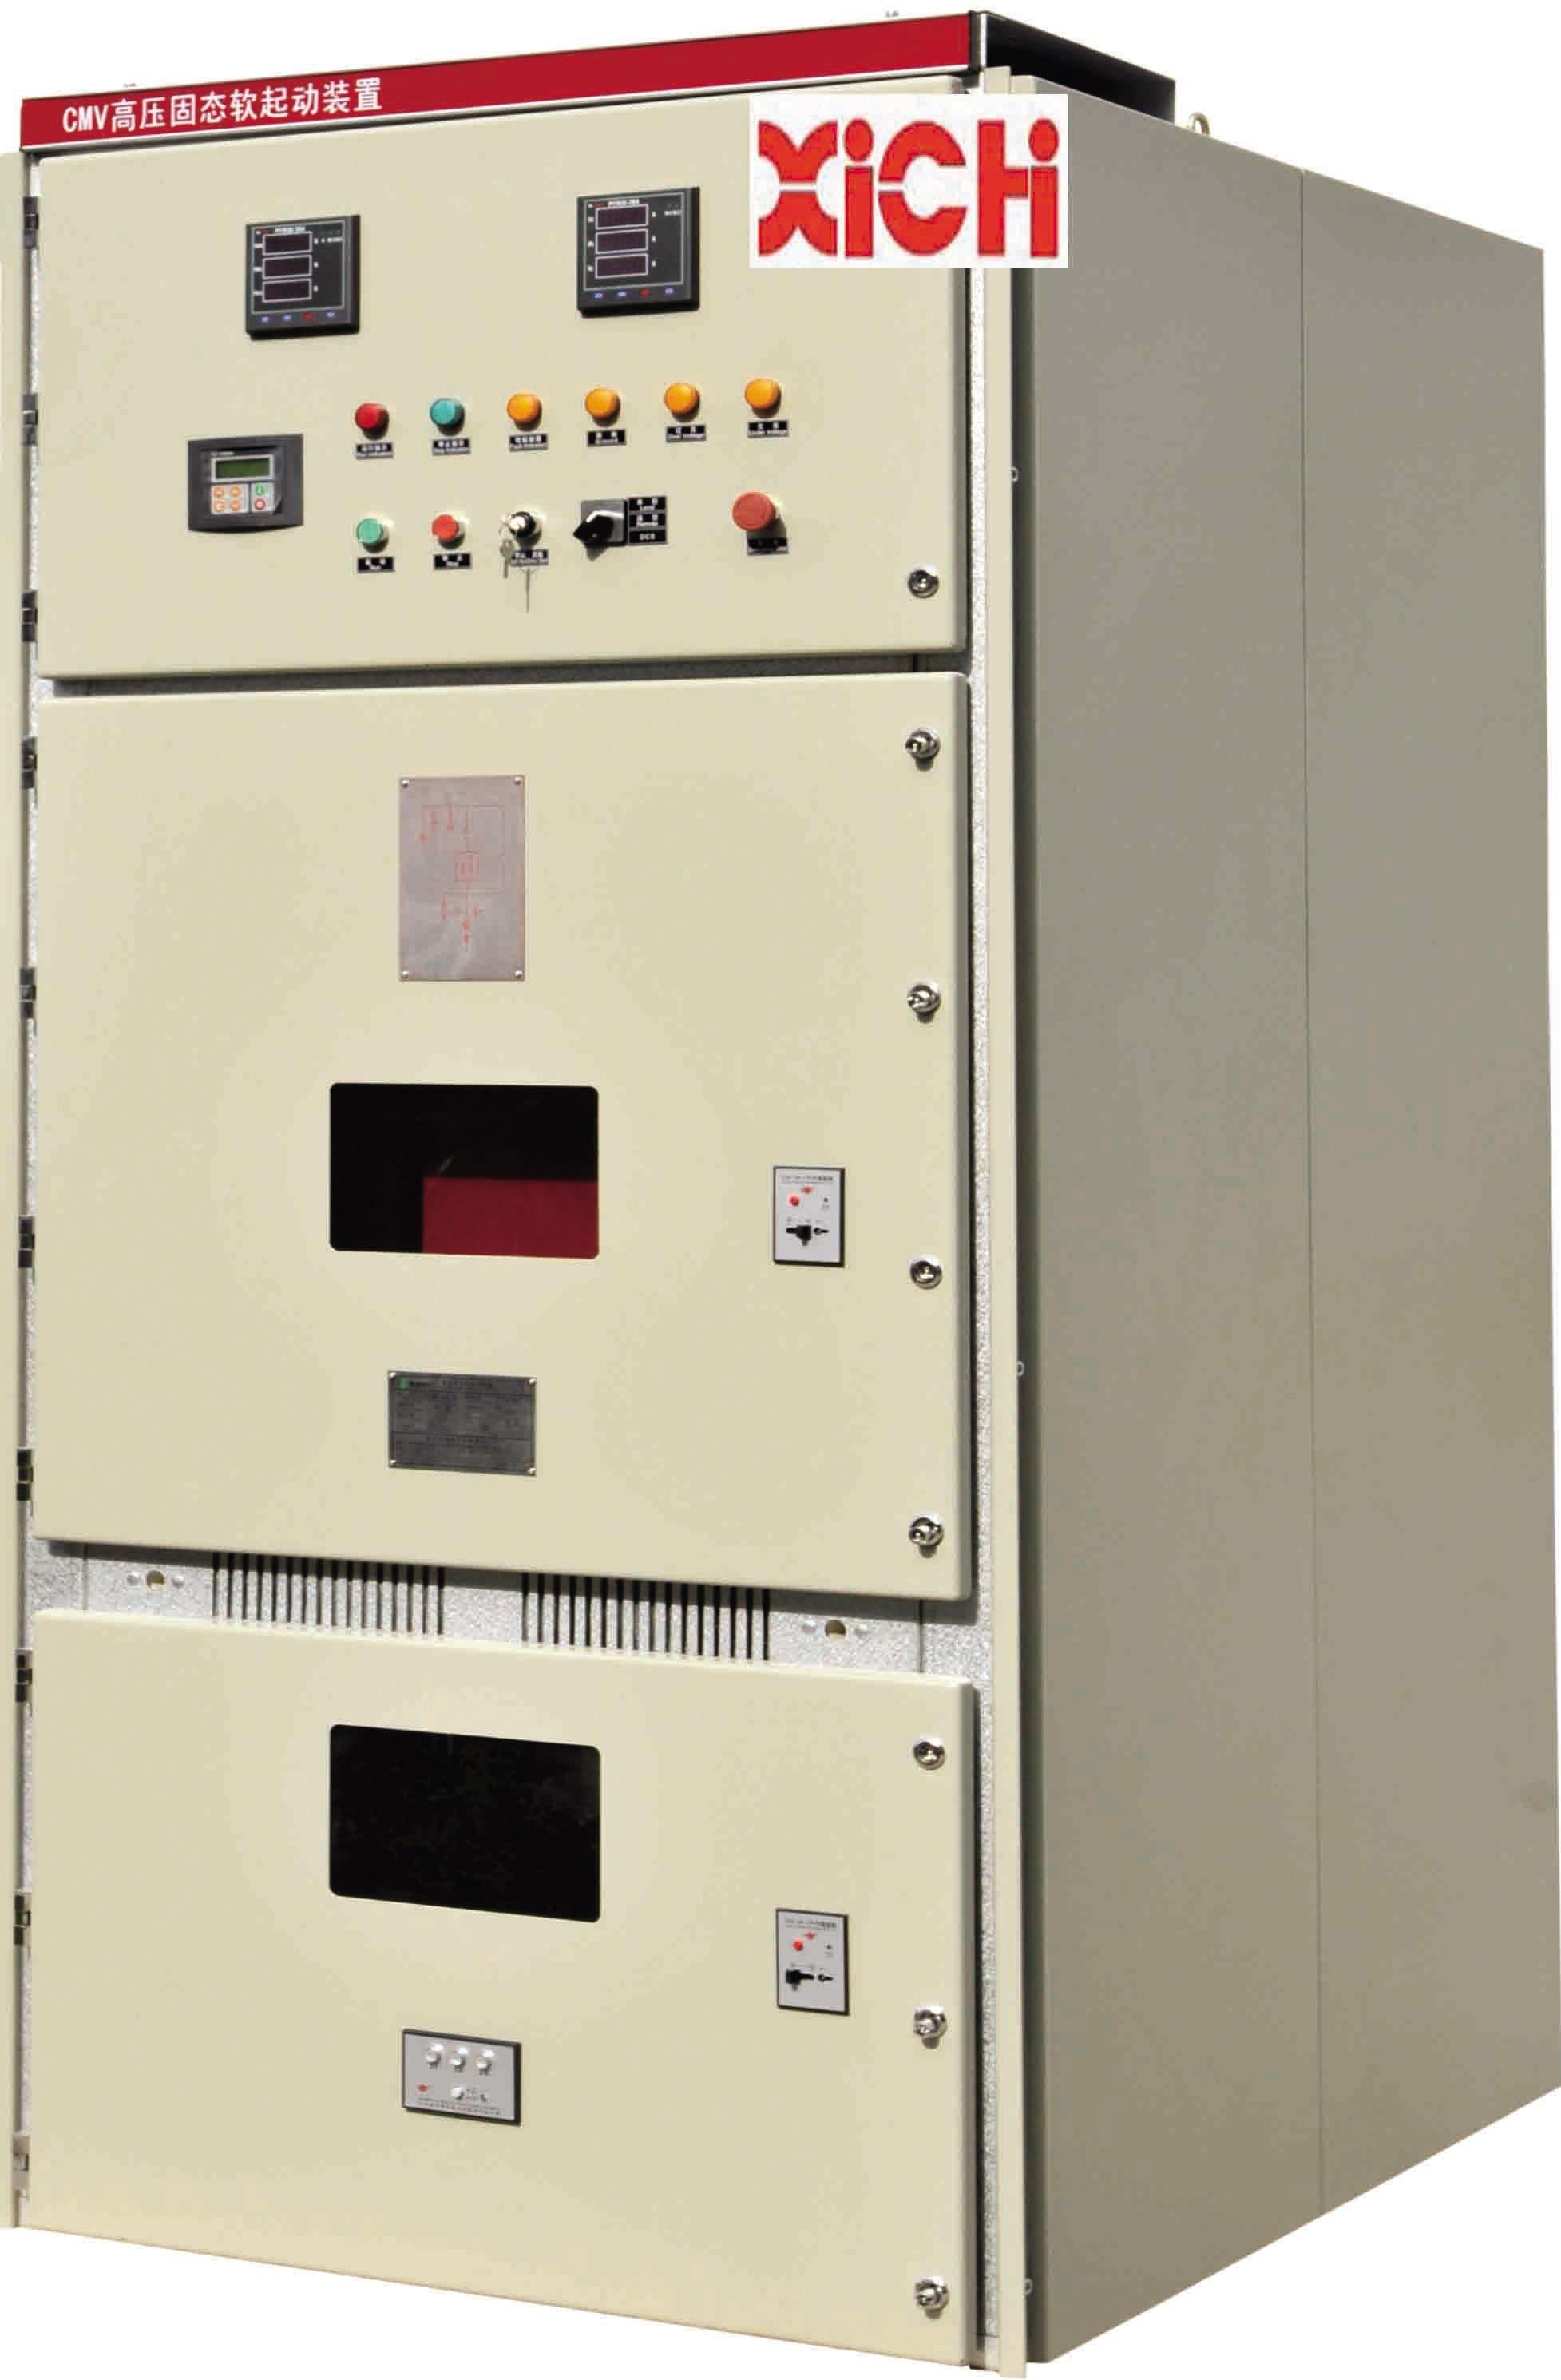 CMV Solid 800kw High Voltage Motor Soft Starter